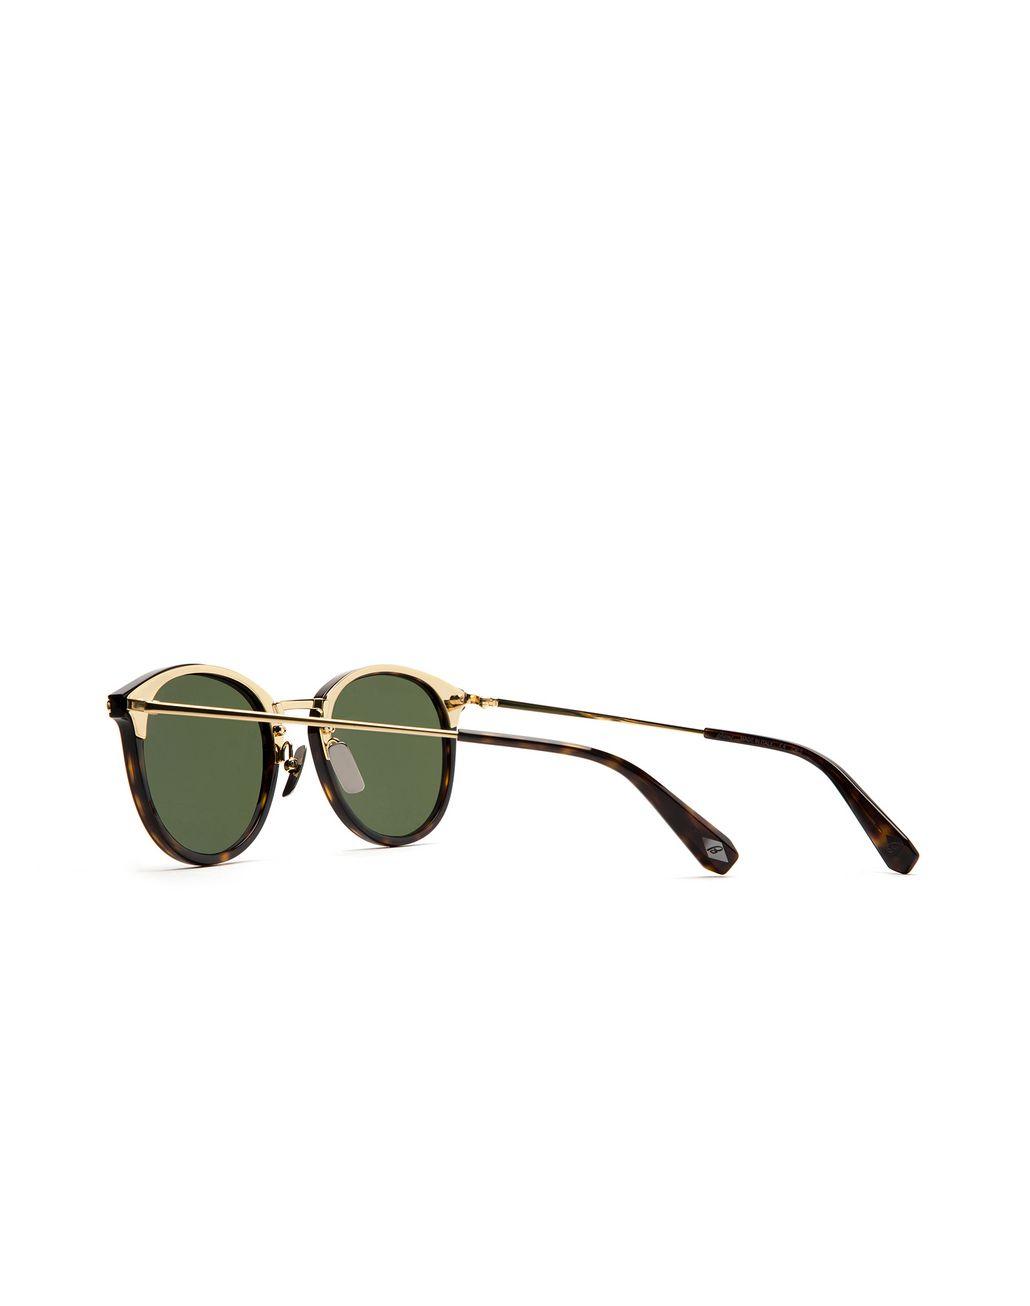 "BRIONI Солнцезащитные очки в блестящей оправе цвета ""гавана"" с зелеными линзами Солнцезащитные очки Для Мужчин d"